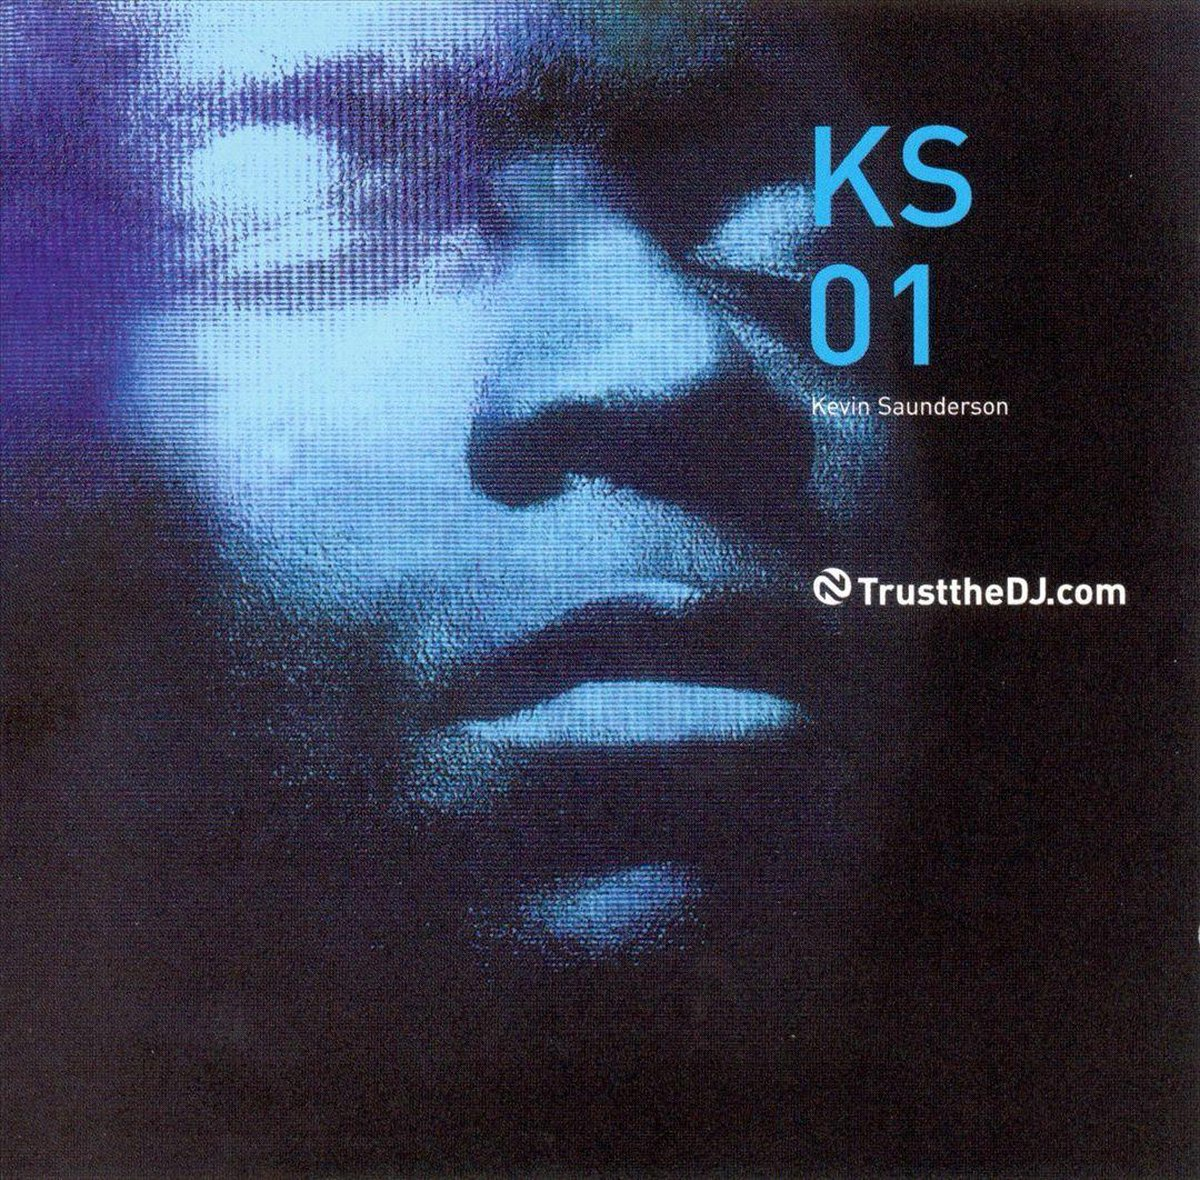 Trust the DJ: KS01 - Octave One